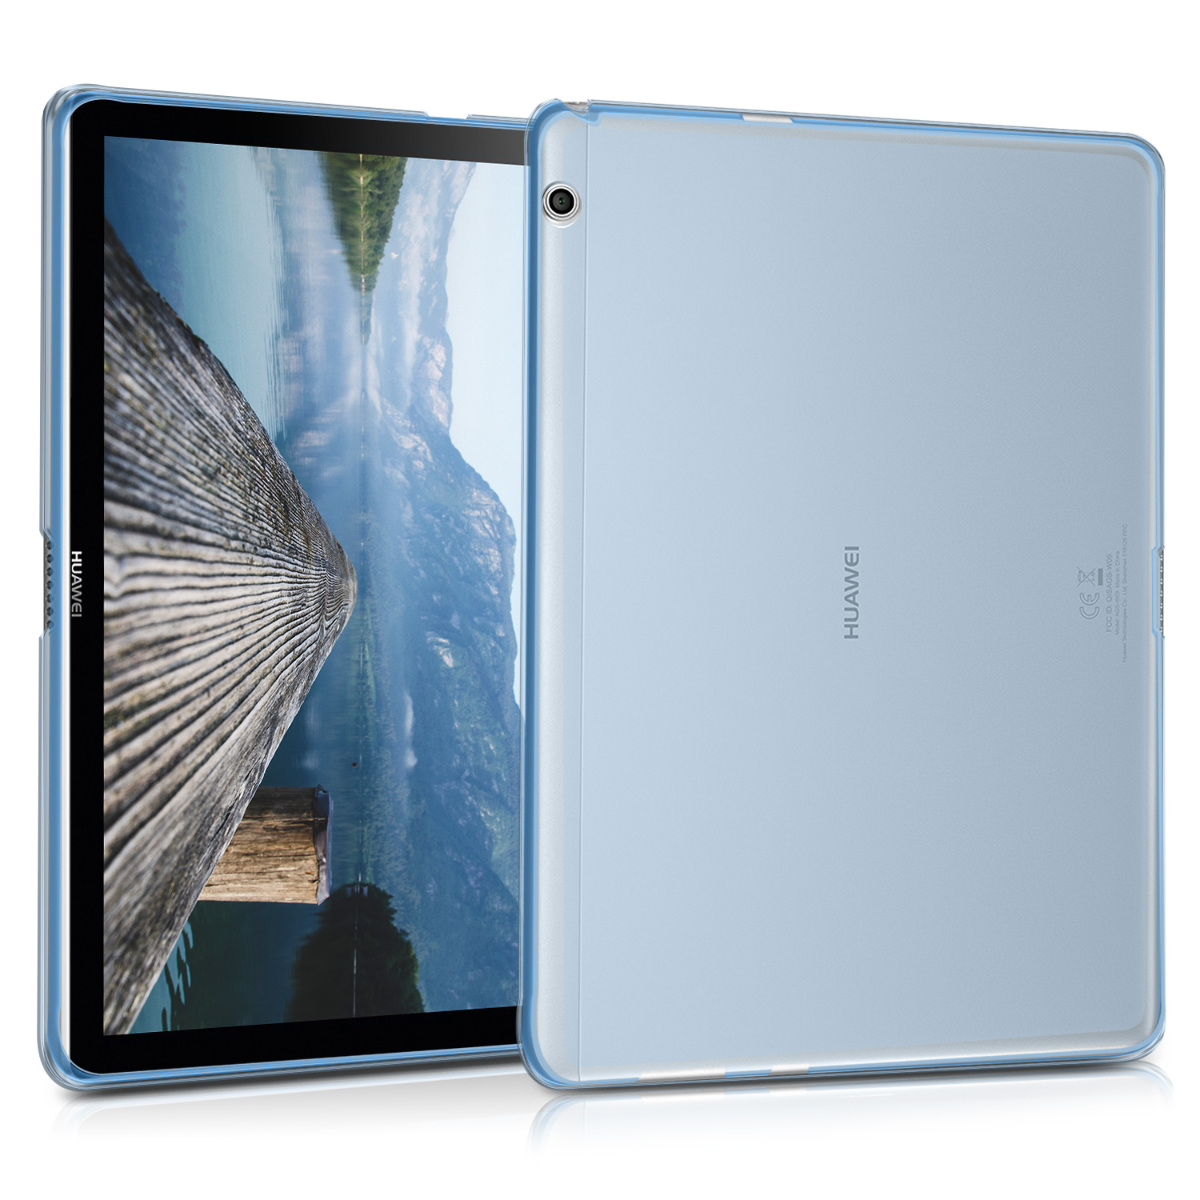 KW Ημιδιάφανη Θήκη Σιλικόνης Huawei MediaPad T3 10' - Blue (41880.04)